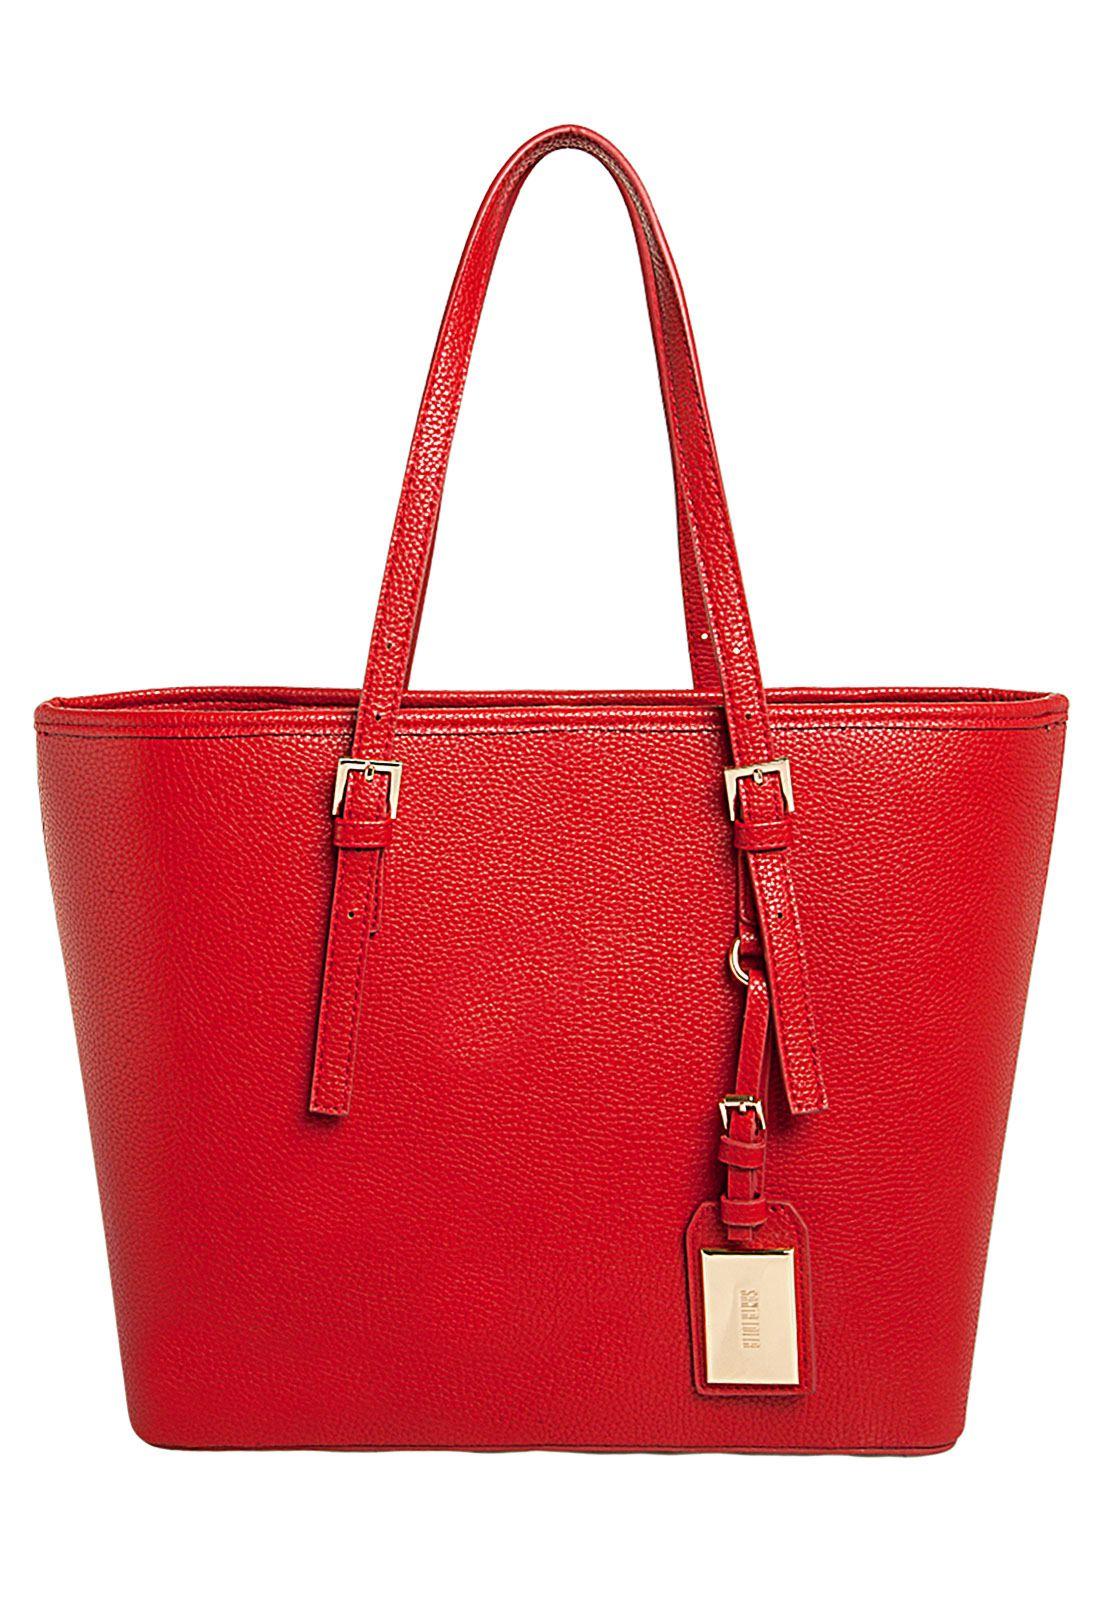 Bolsa Santa Lolla Clean Vermelha - Compre Agora   Dafiti Brasil   Moda bb0627e2c5